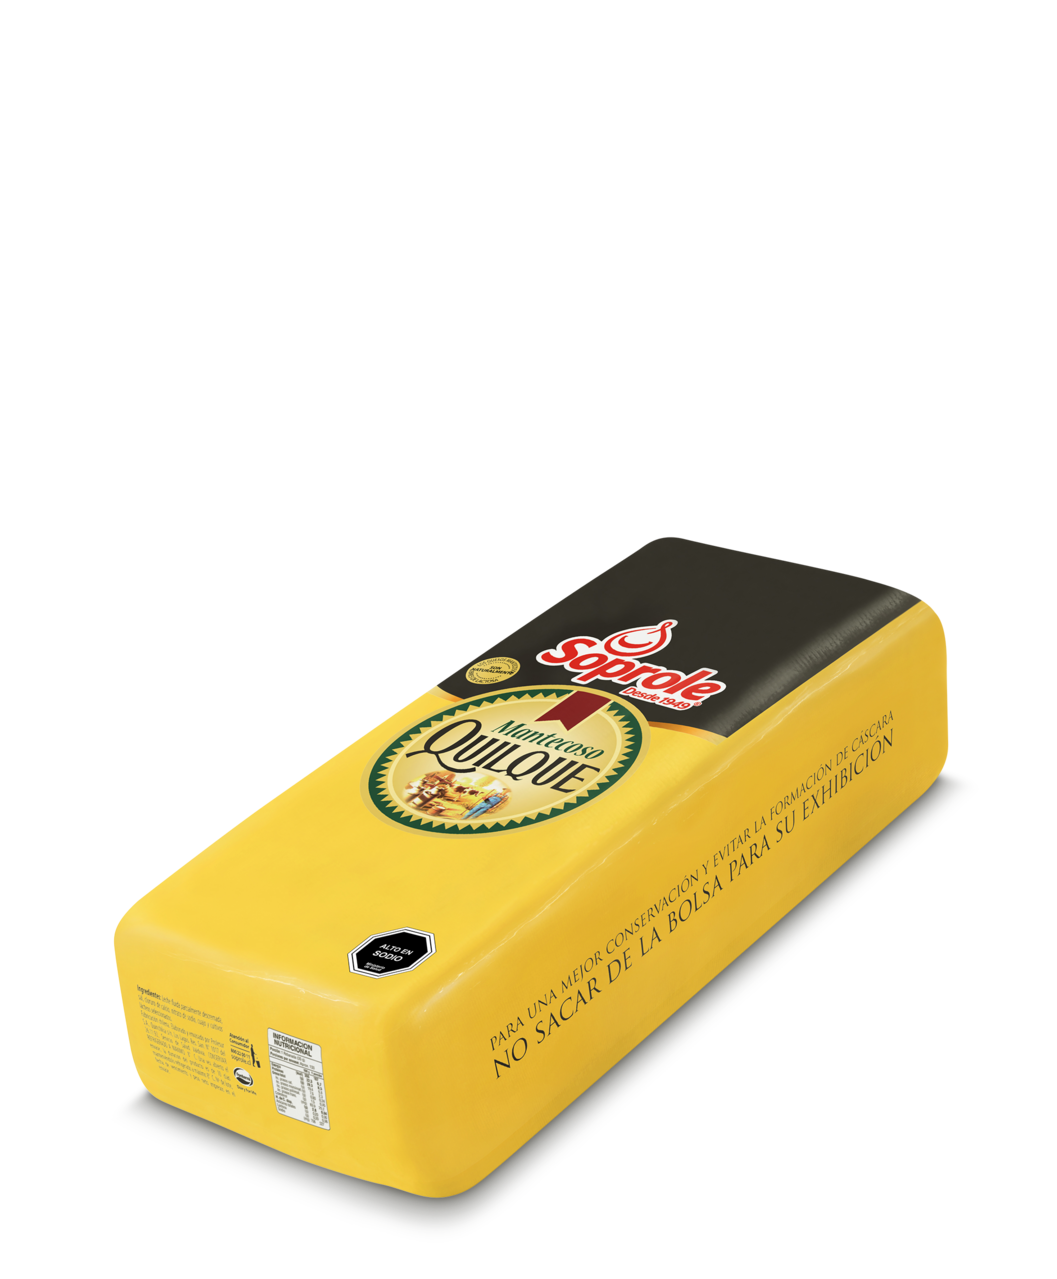 Soprole queso quilque mantecoso barra 4kg